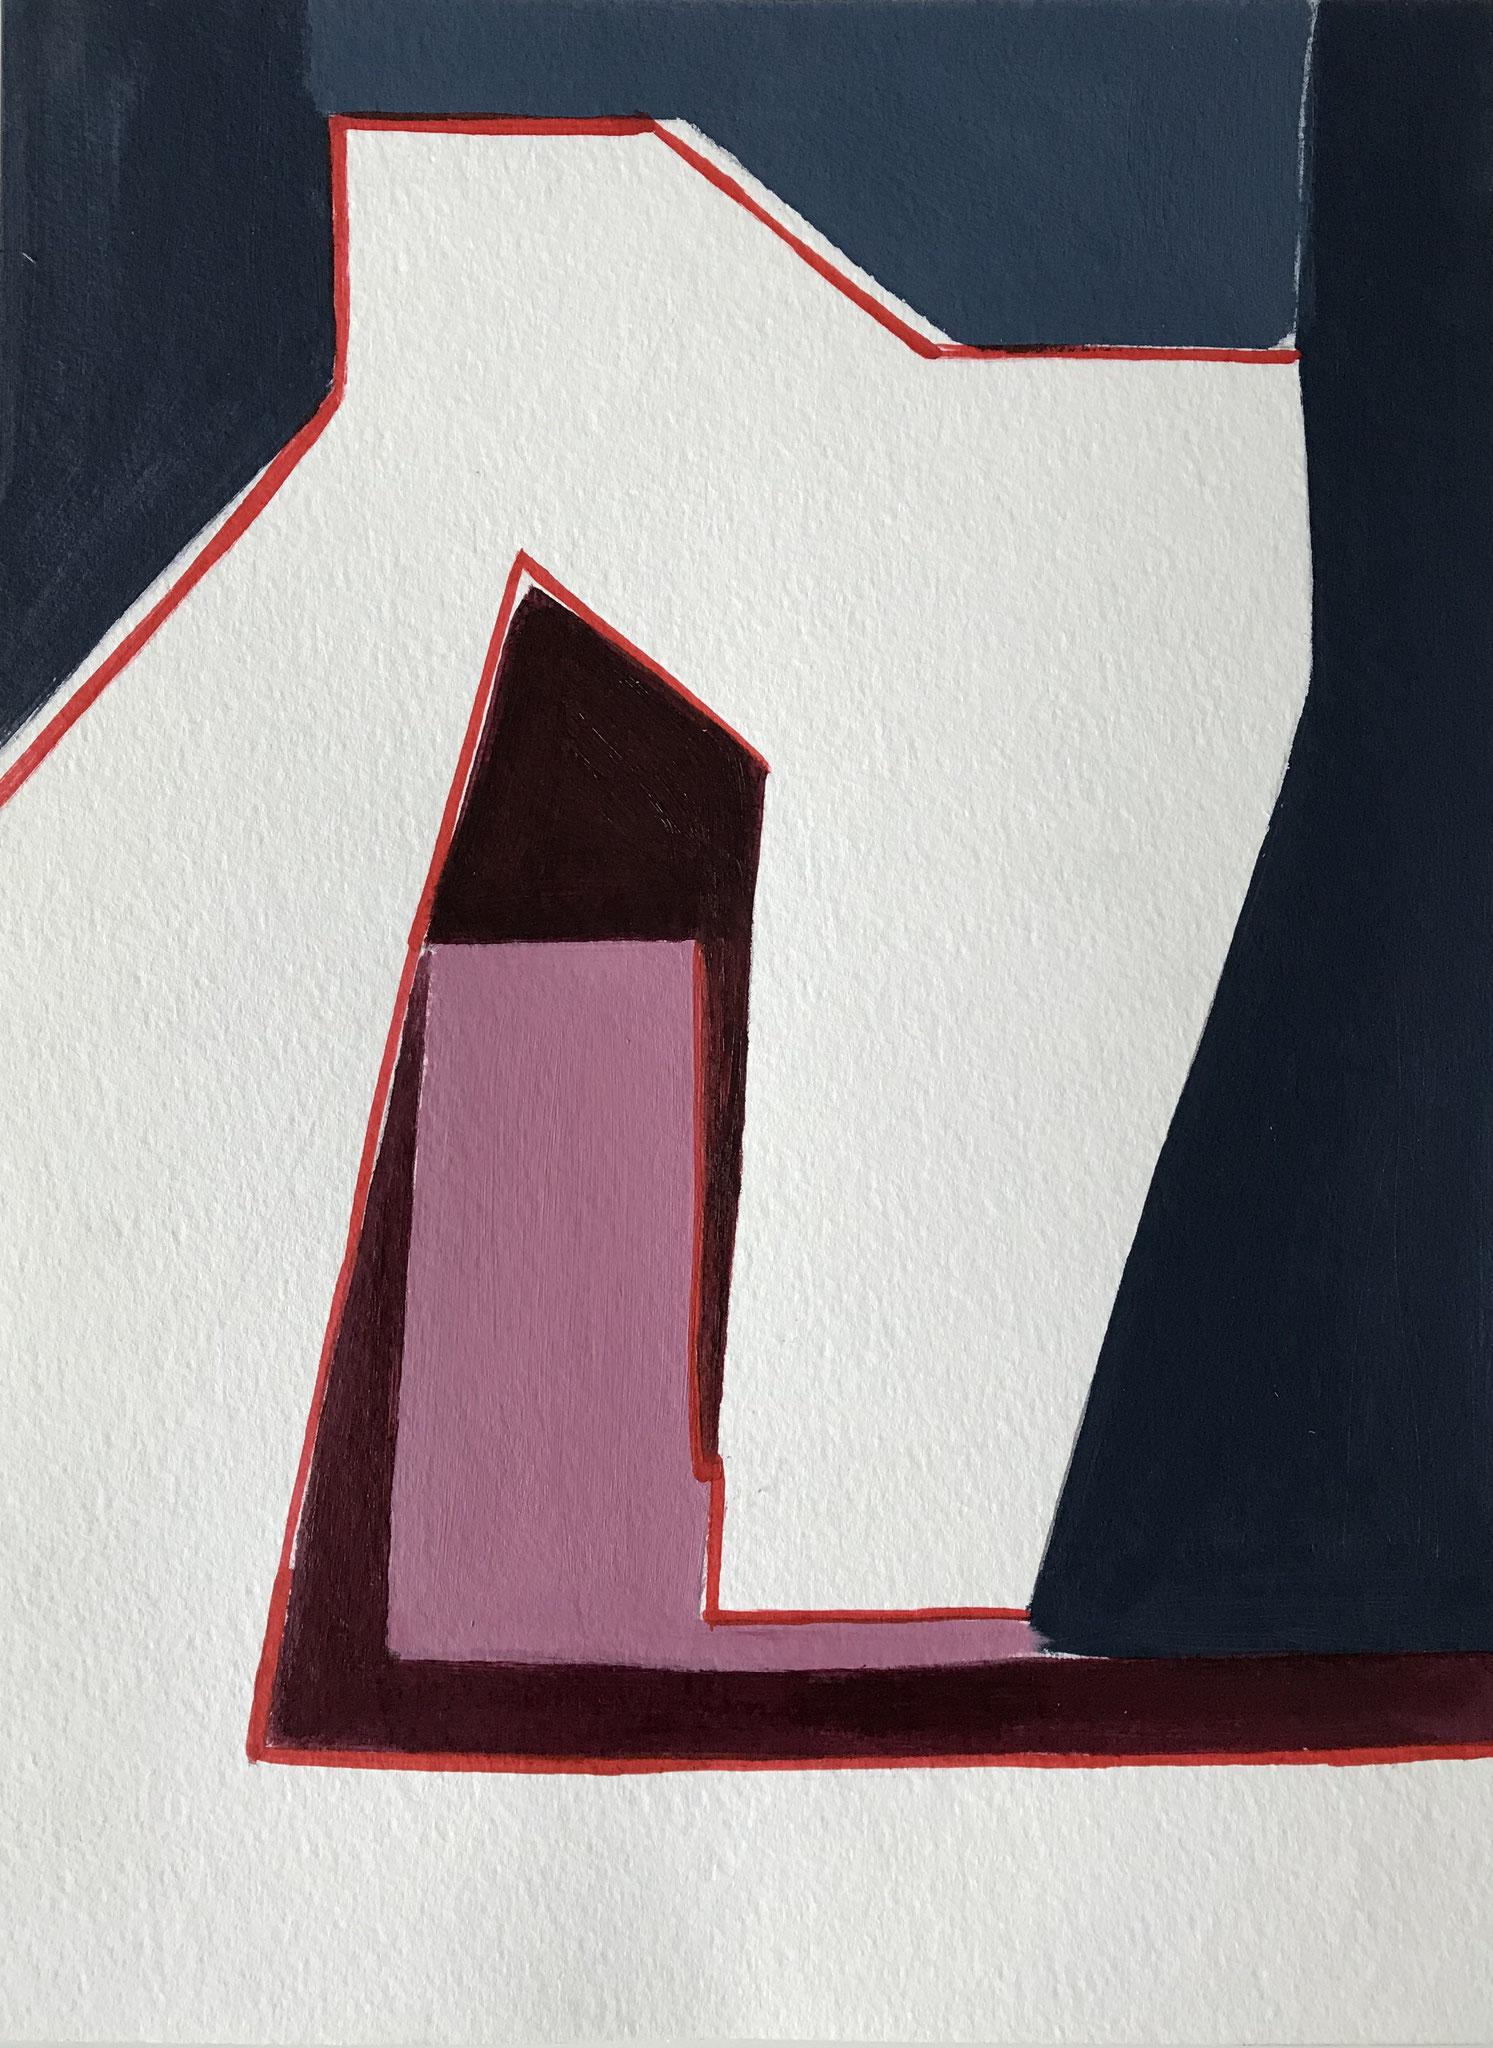 Michel/ Piz Uter, Acryl auf Papier, 29 x 21cm, 2019